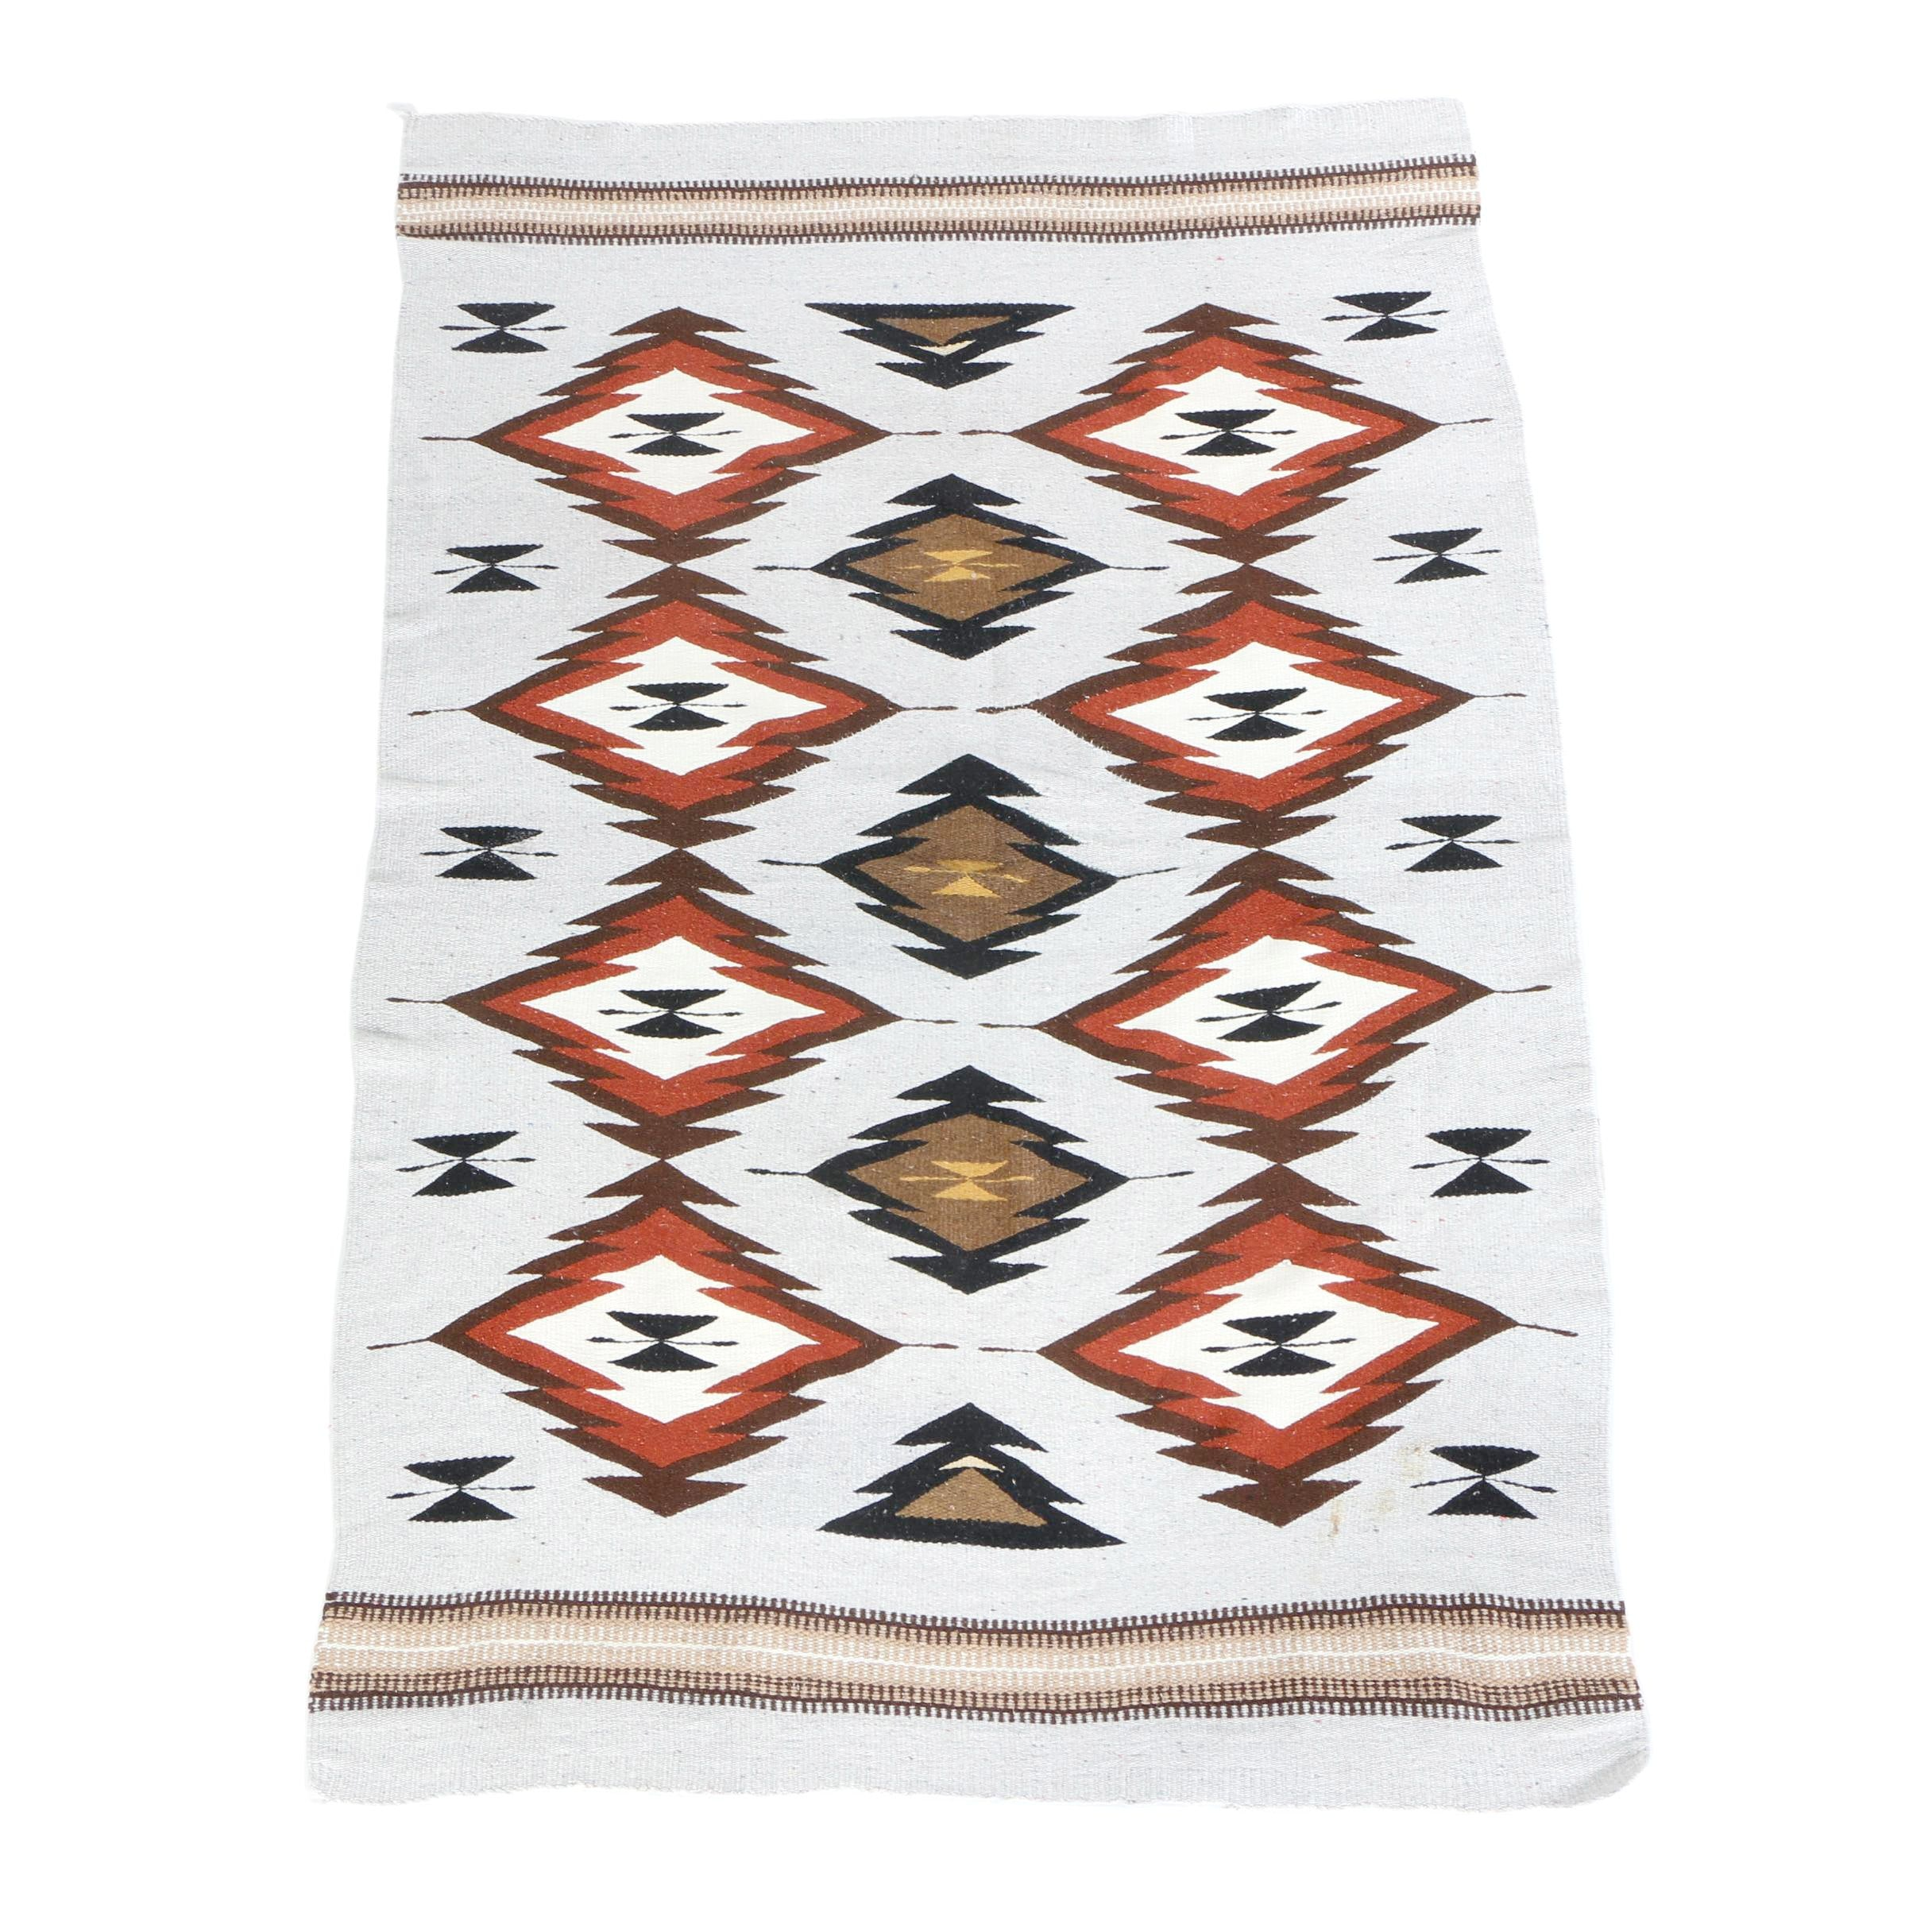 Southwestern Style Hand Knit Blanket